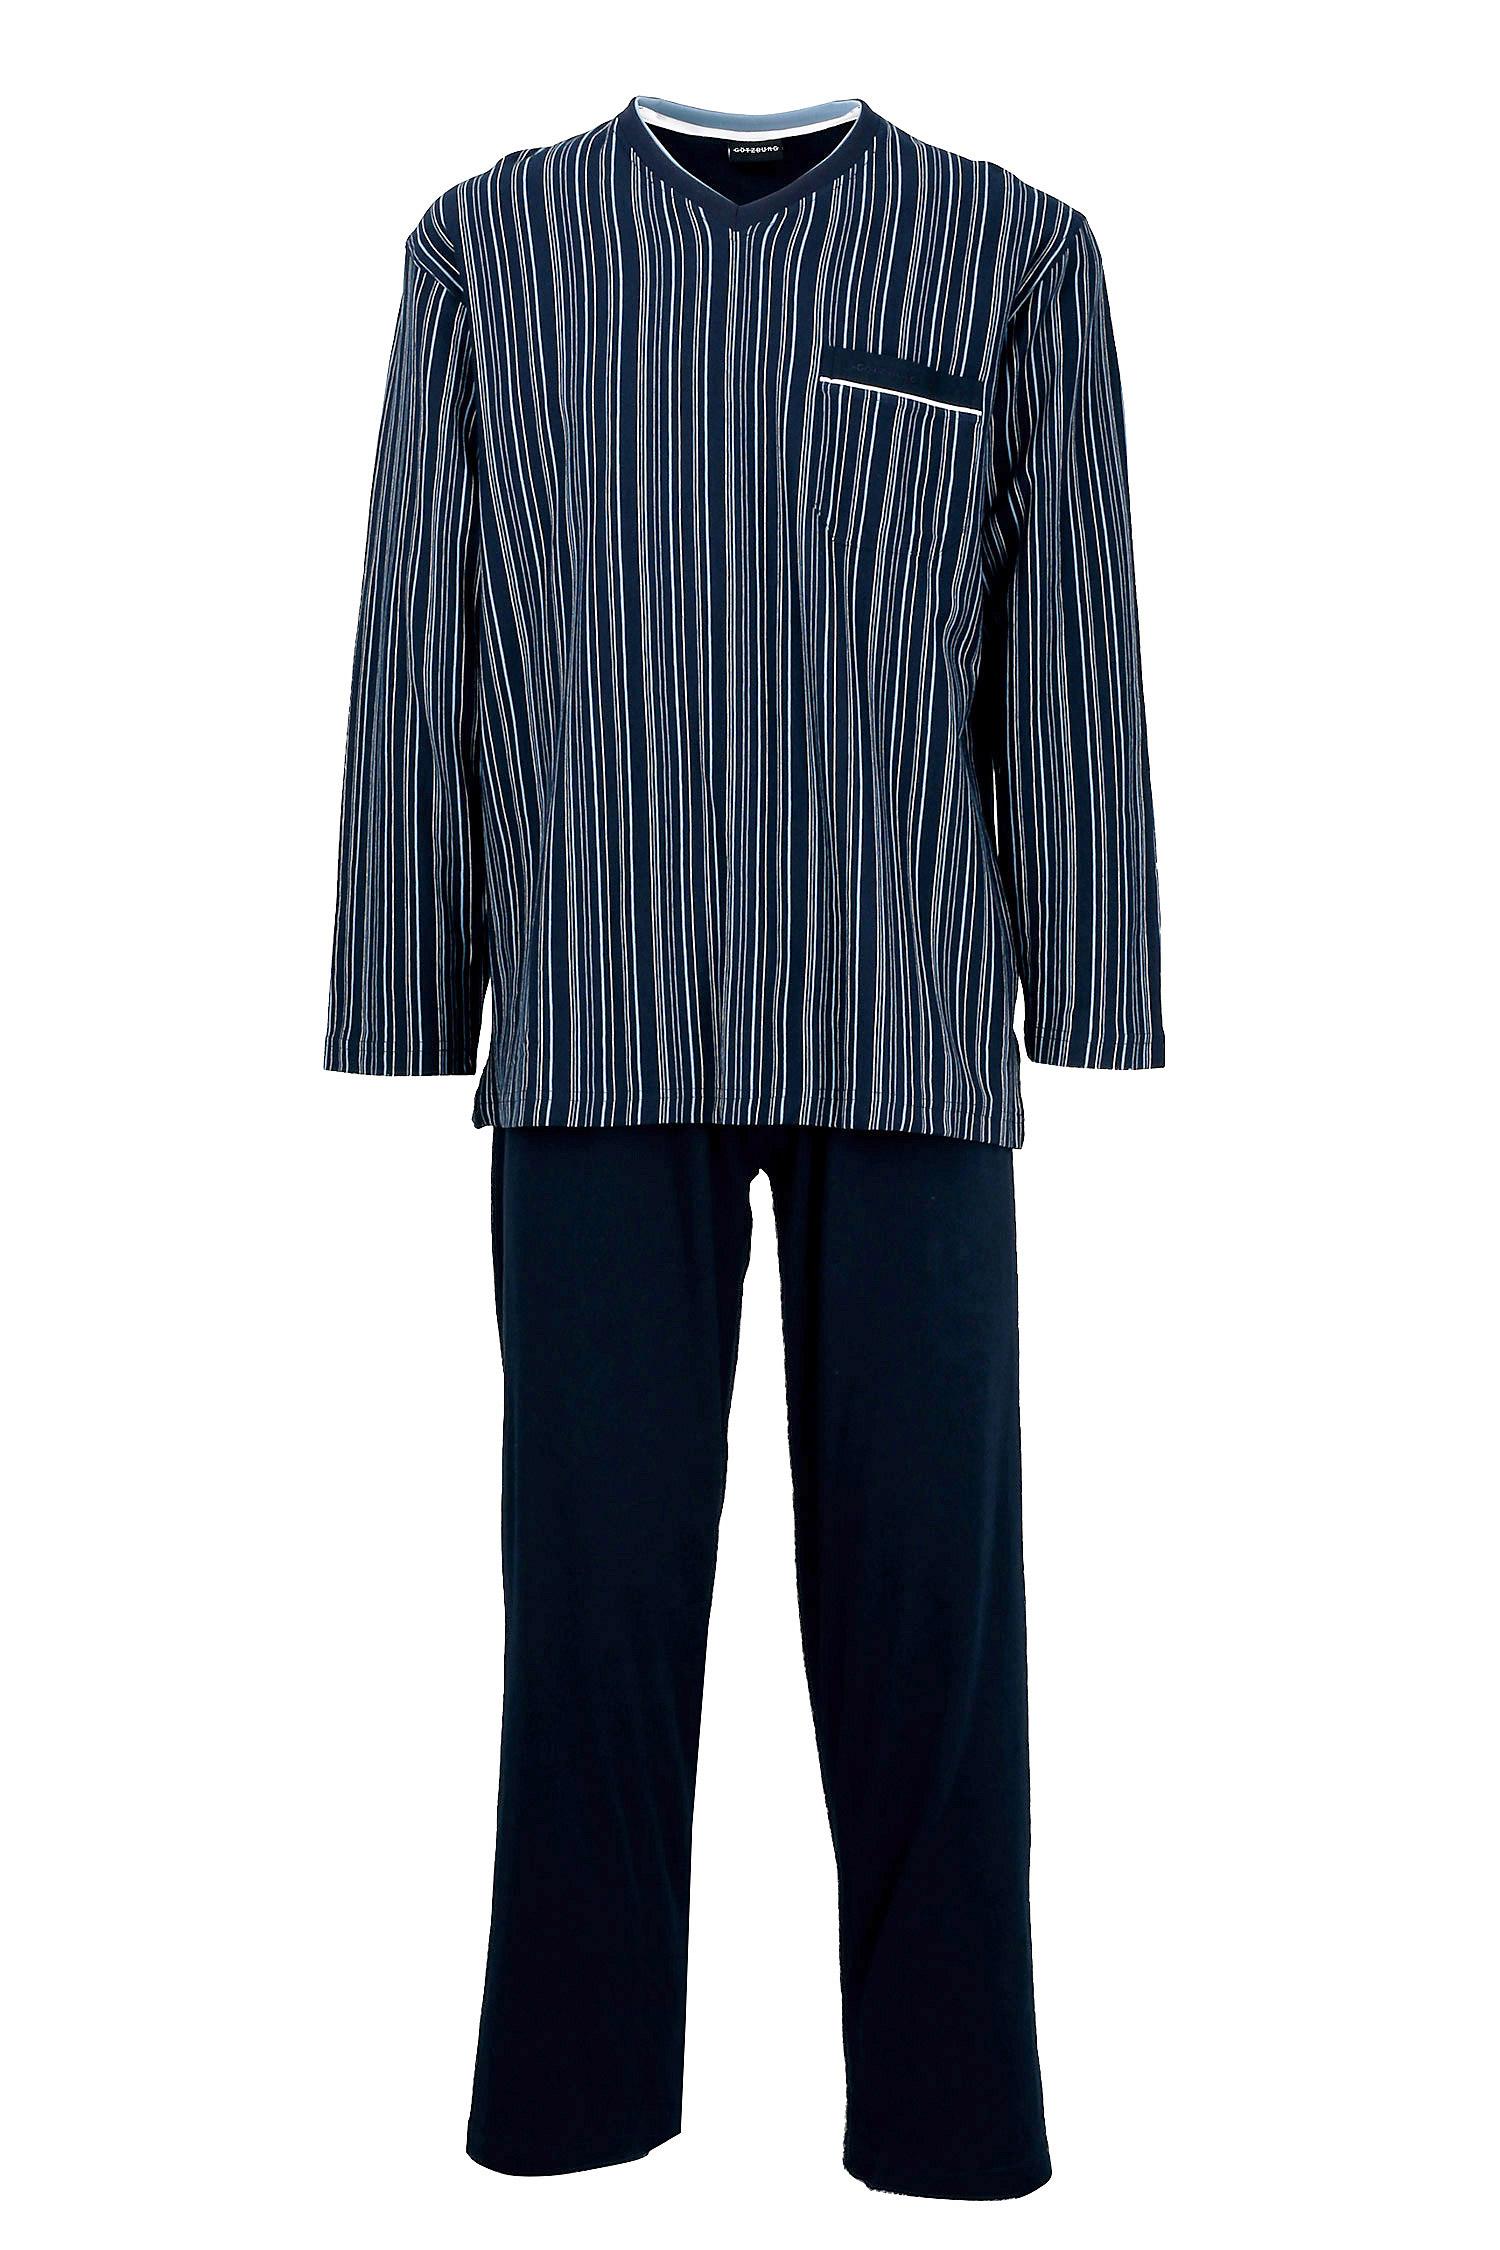 Homewear, Pijama M. Larga, 108722, MARINO | Zoom